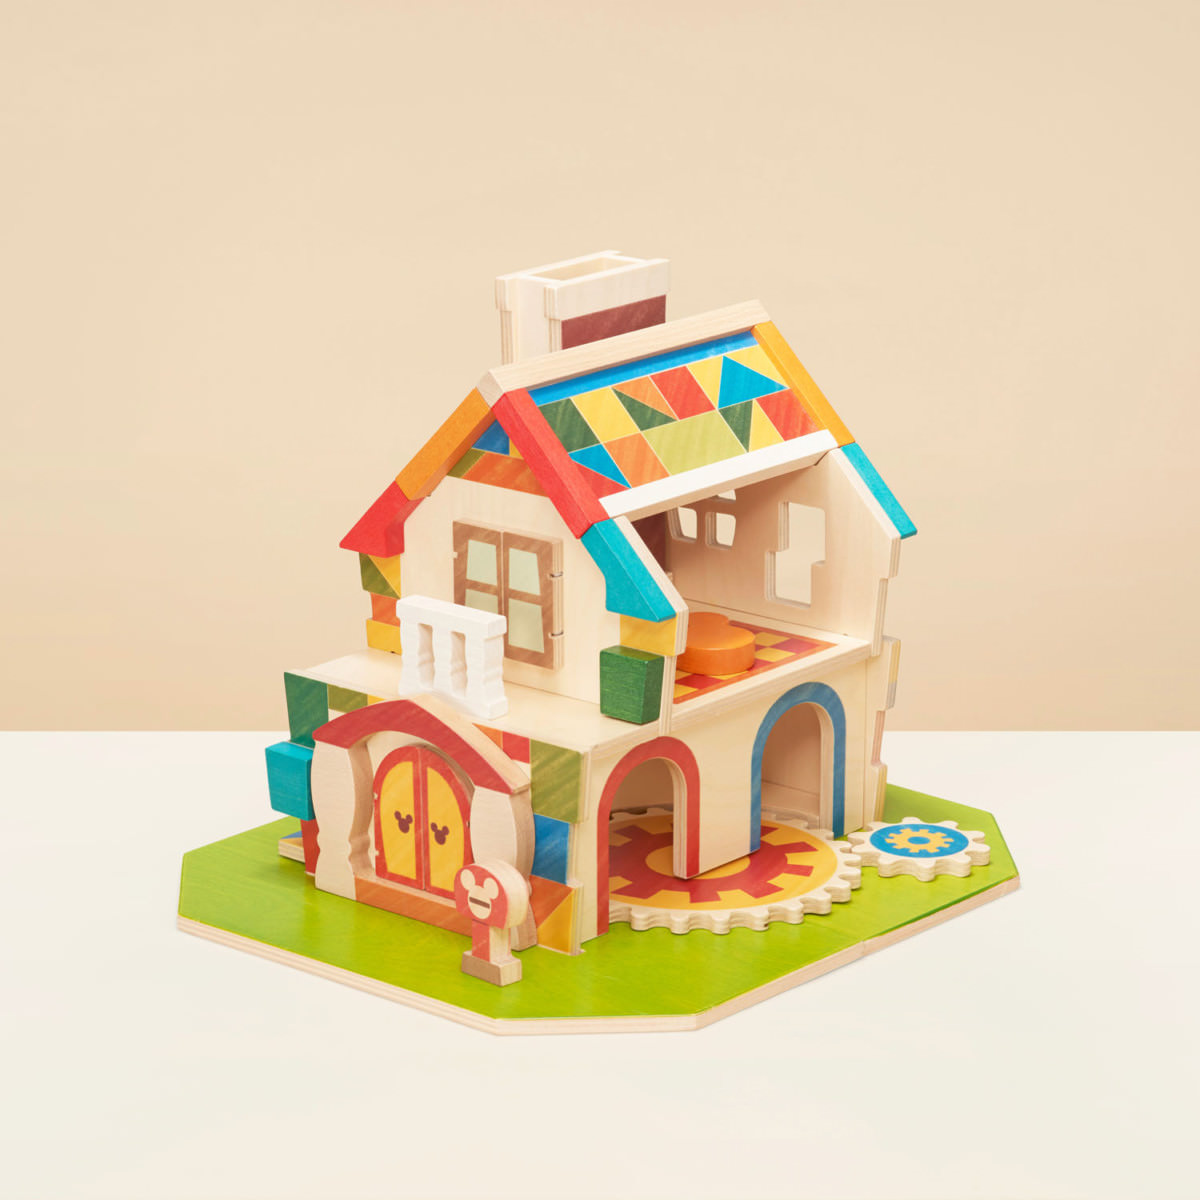 KIDEA HOUSE ミッキー&フレンズ4